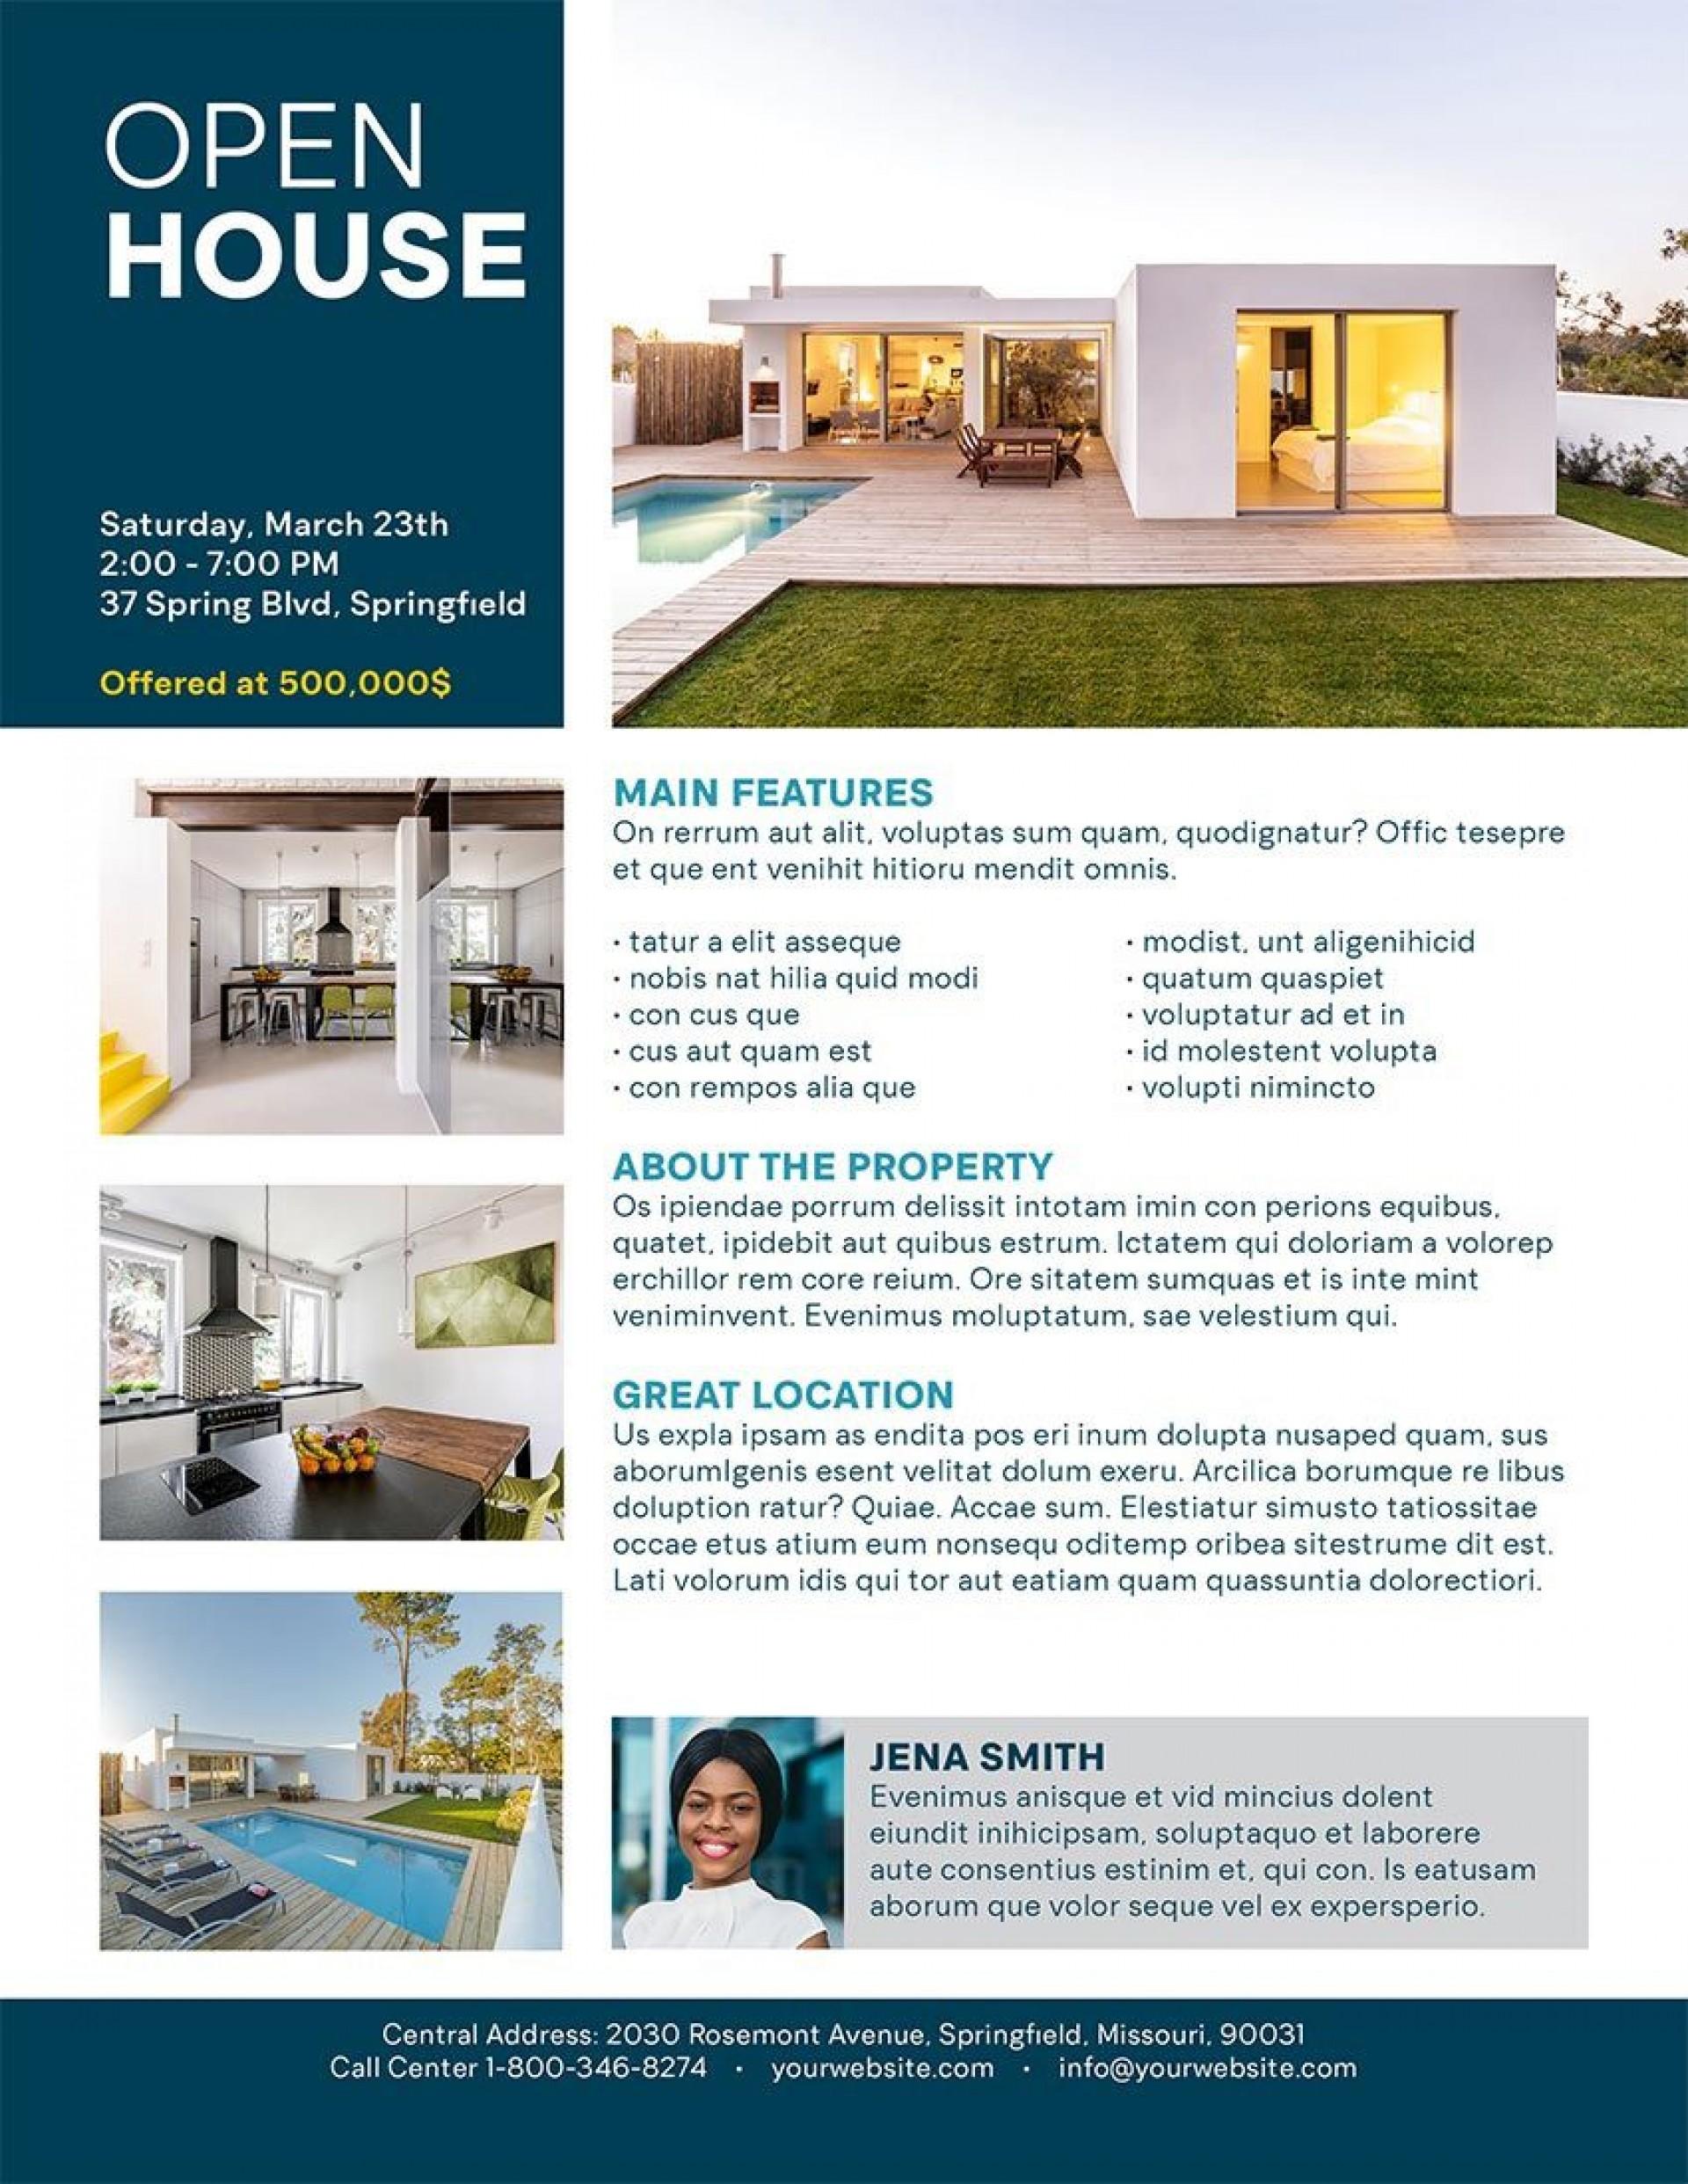 000 Impressive Open House Flyer Template Free Highest Quality  Microsoft Word School Christma1920